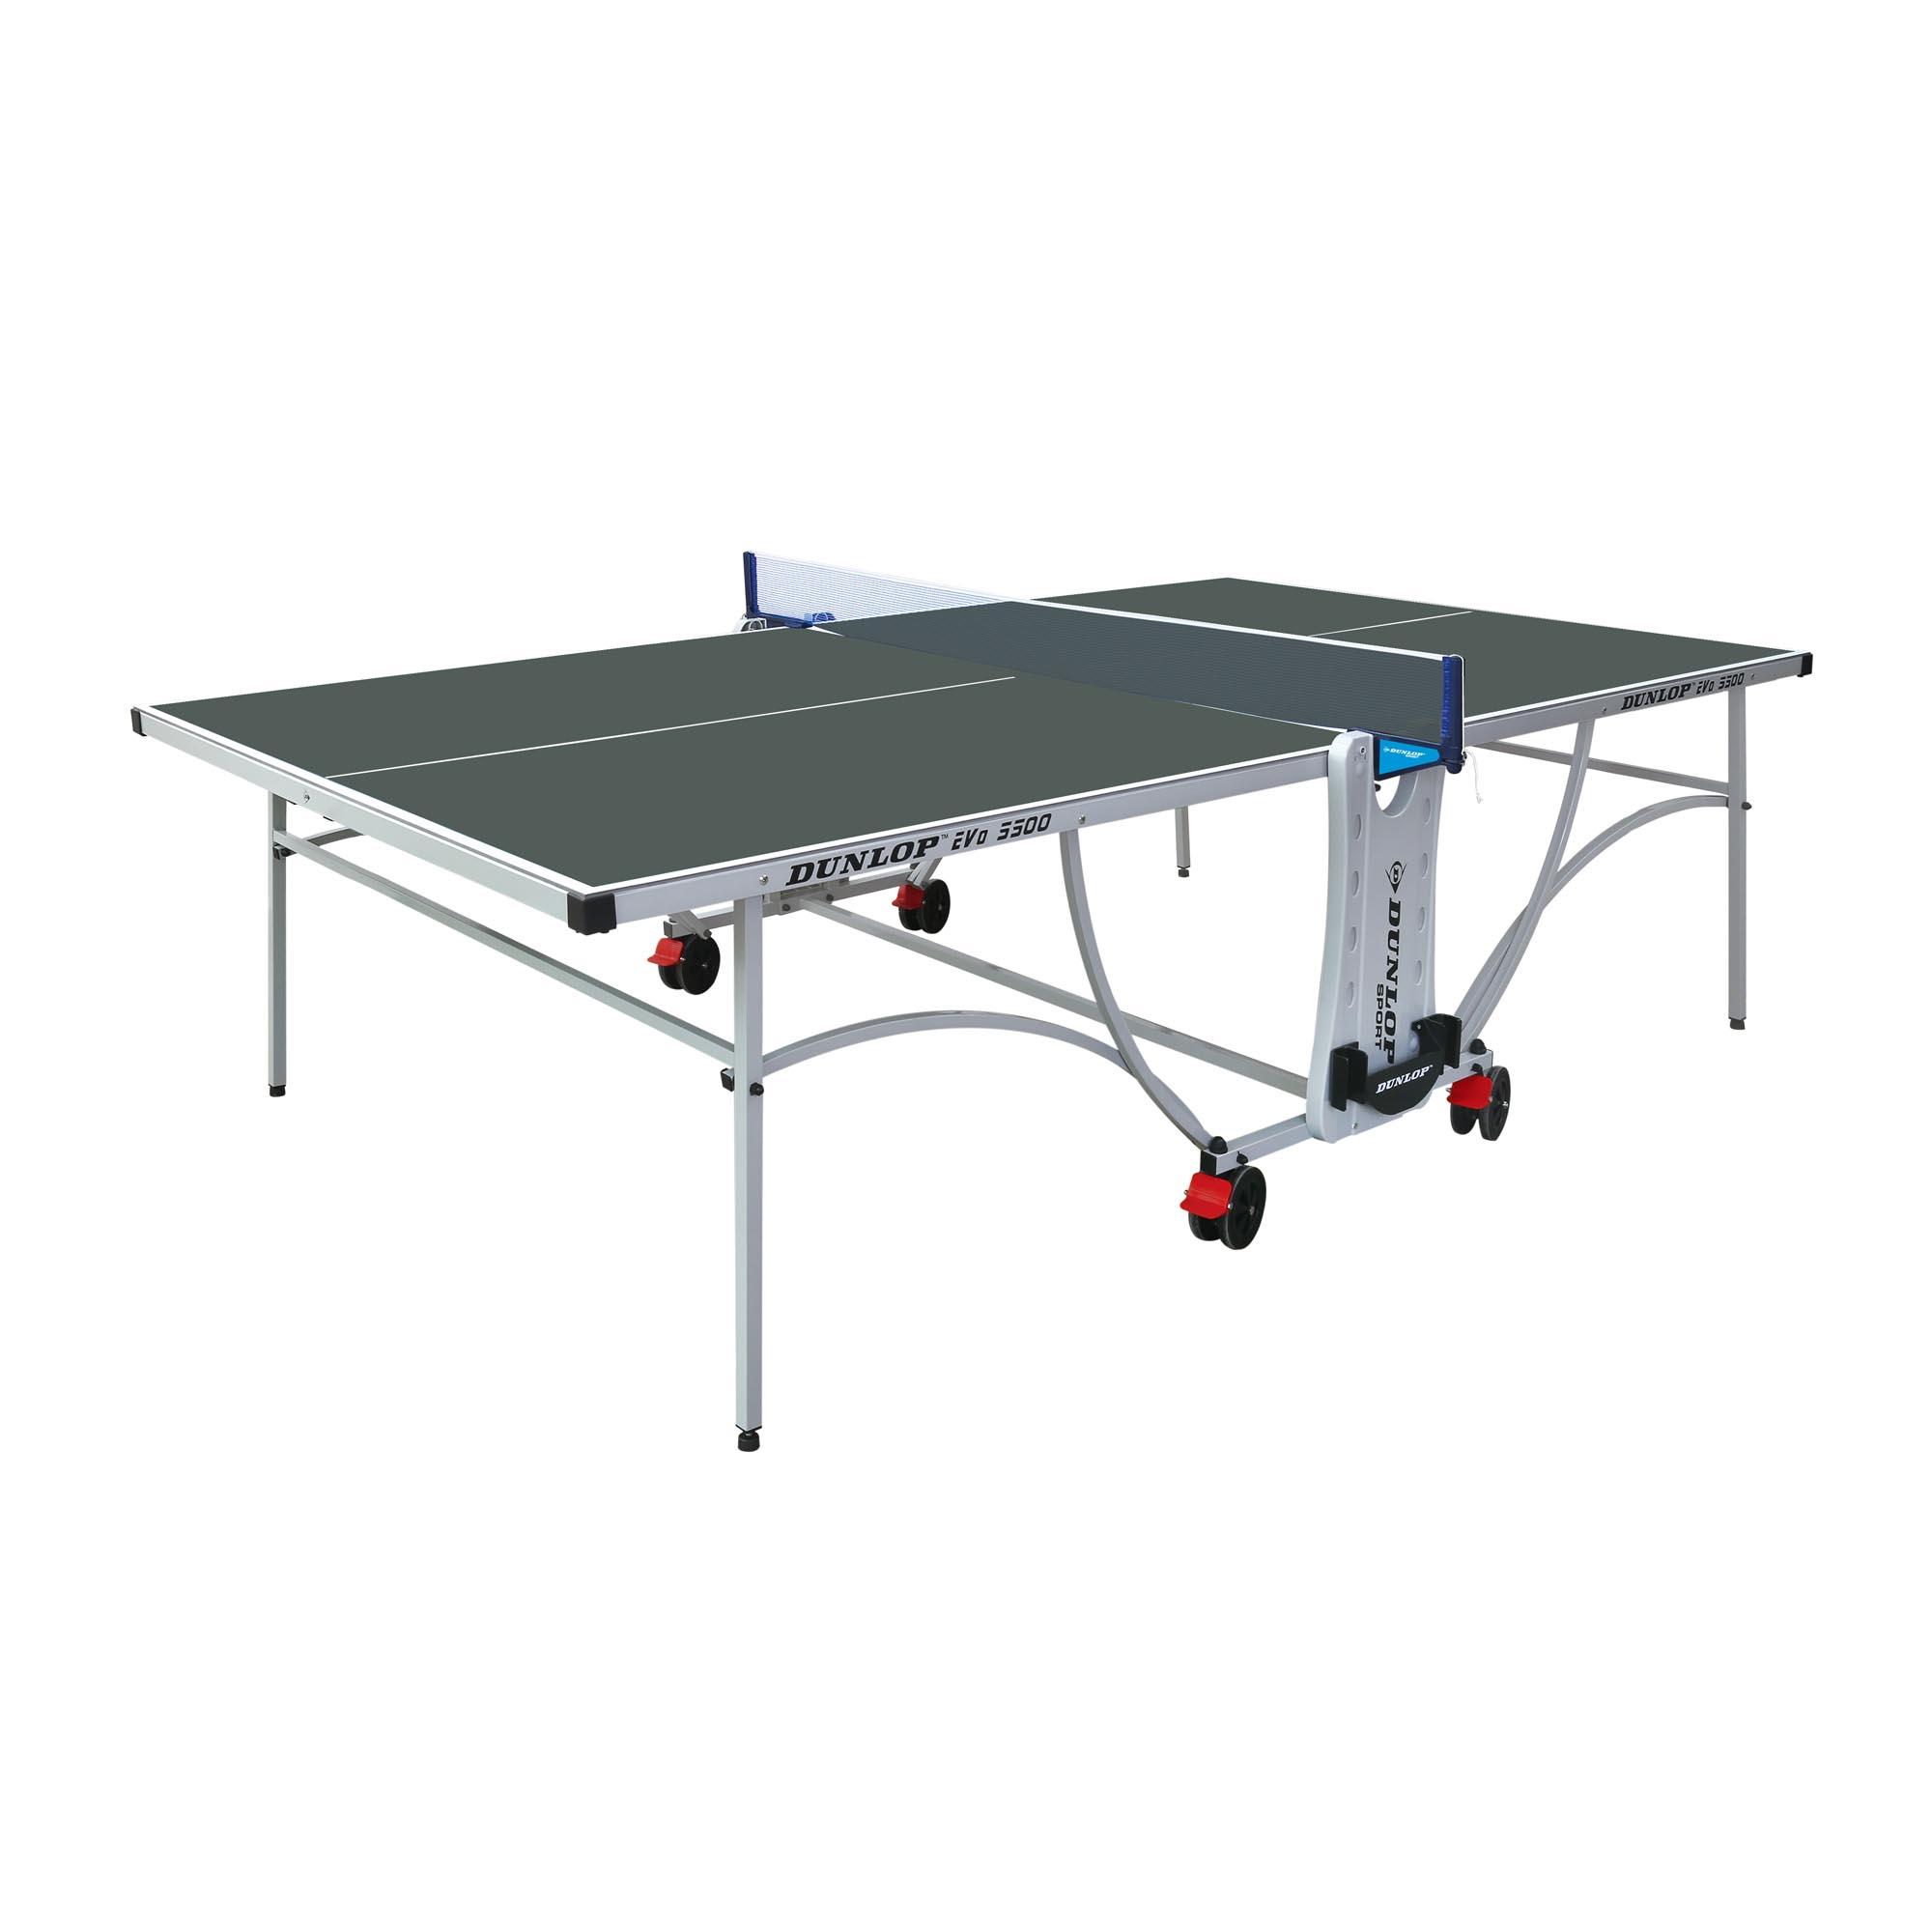 Dunlop Evo 5500 Outdoor Table Tennis Table  Green